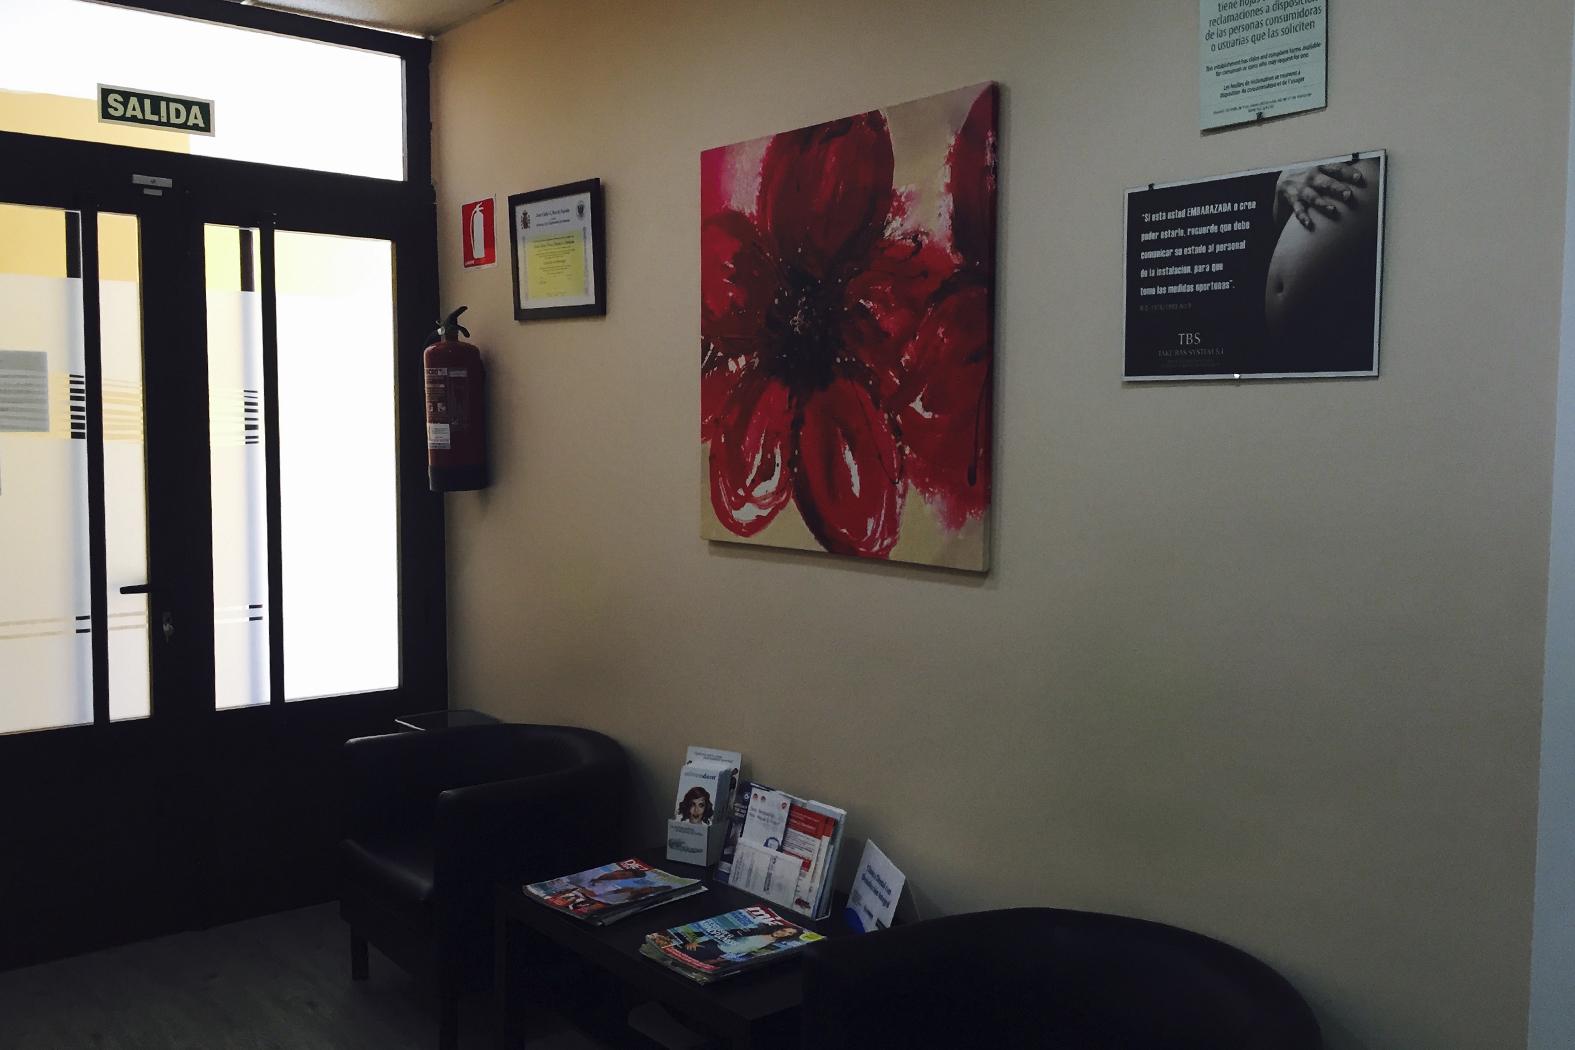 Sala de Espera mejor clinica dental en Granada